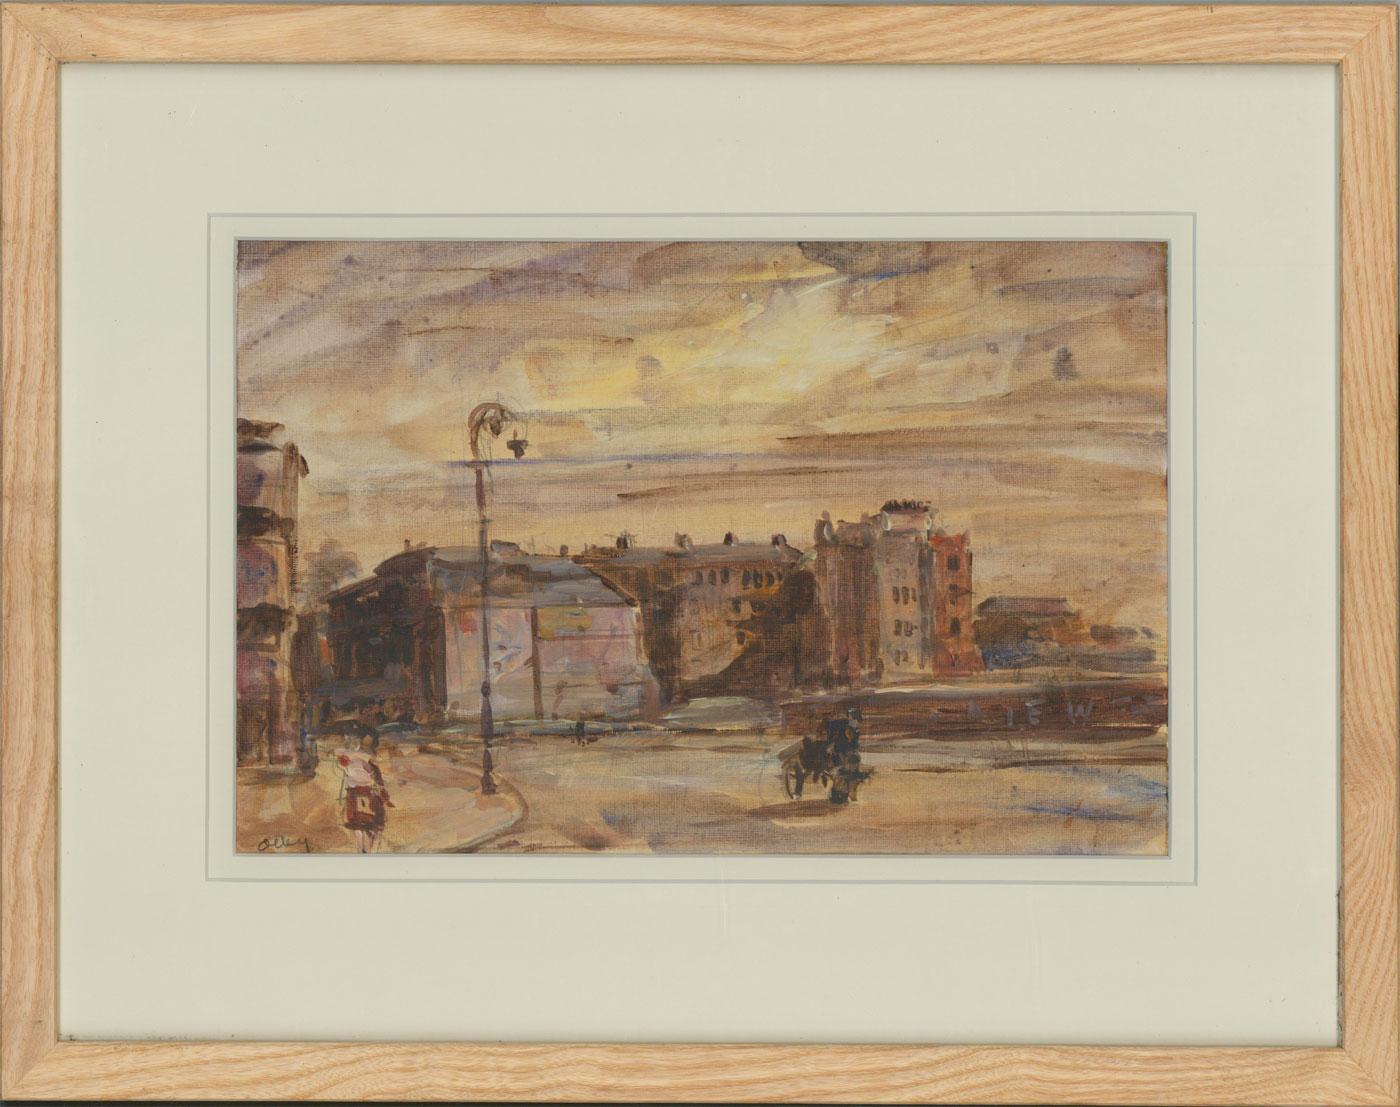 Ronald Olley (b.1923) - c. 2000 Acrylic, Street Scene with Figures